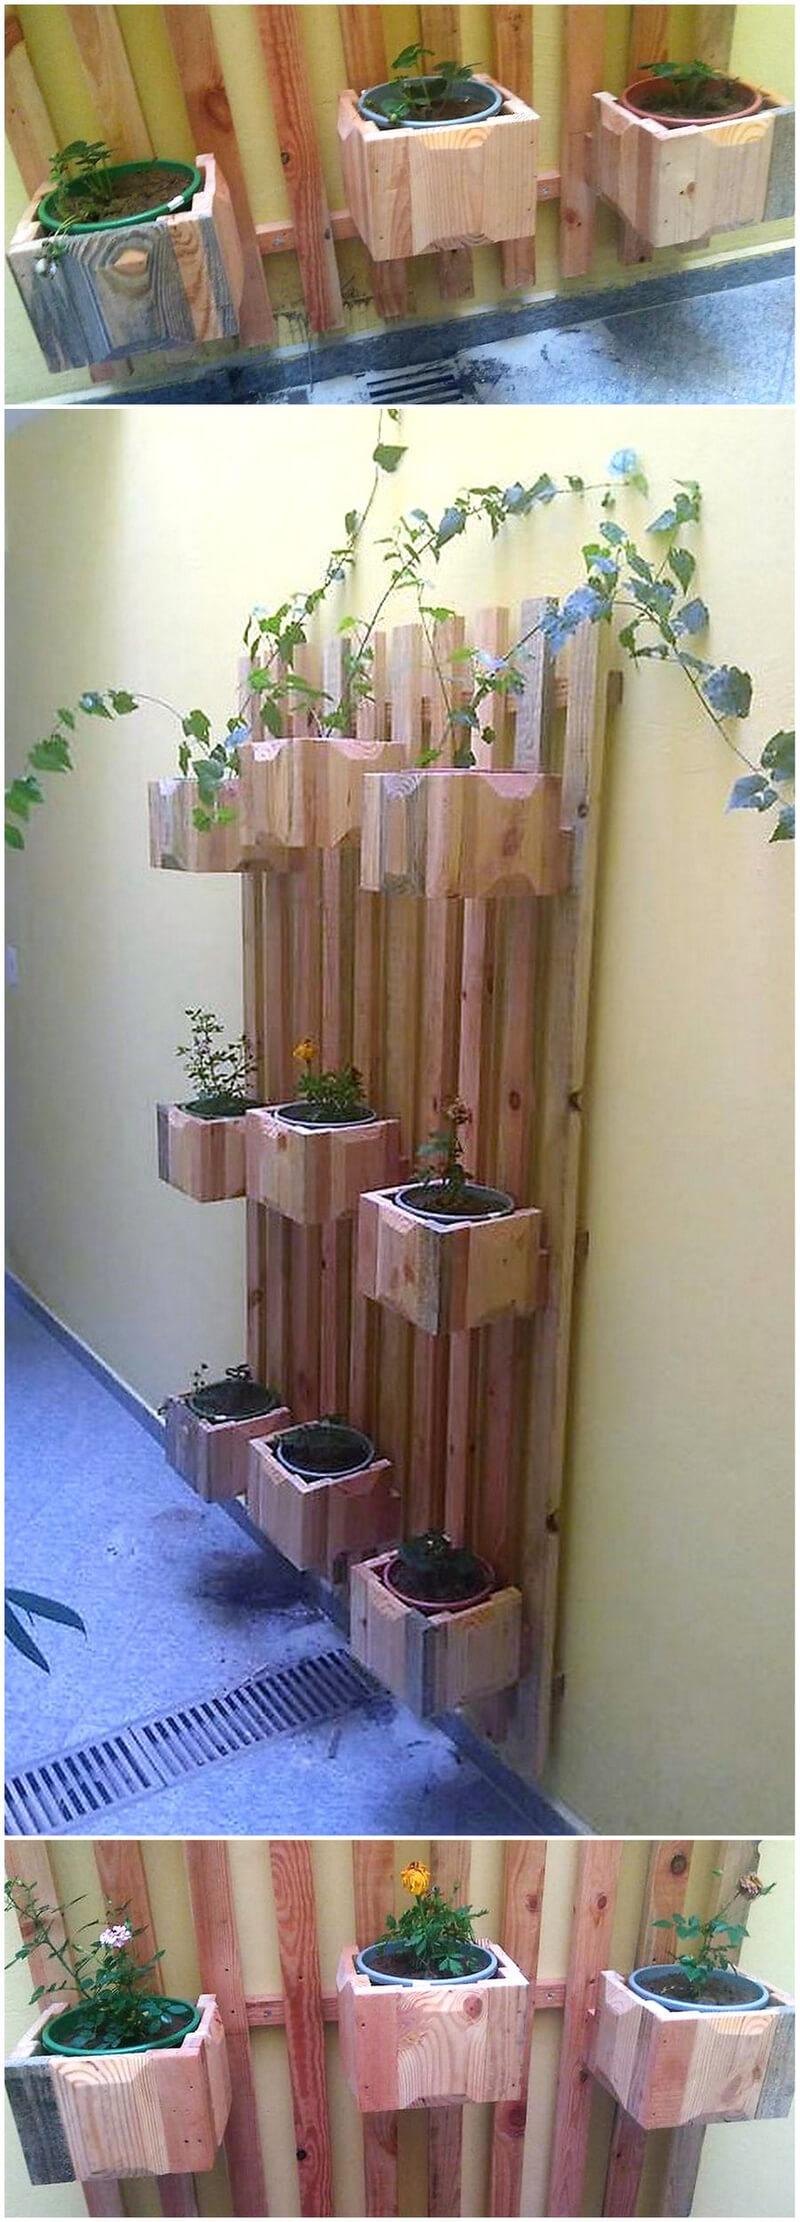 pallets wall planter idea